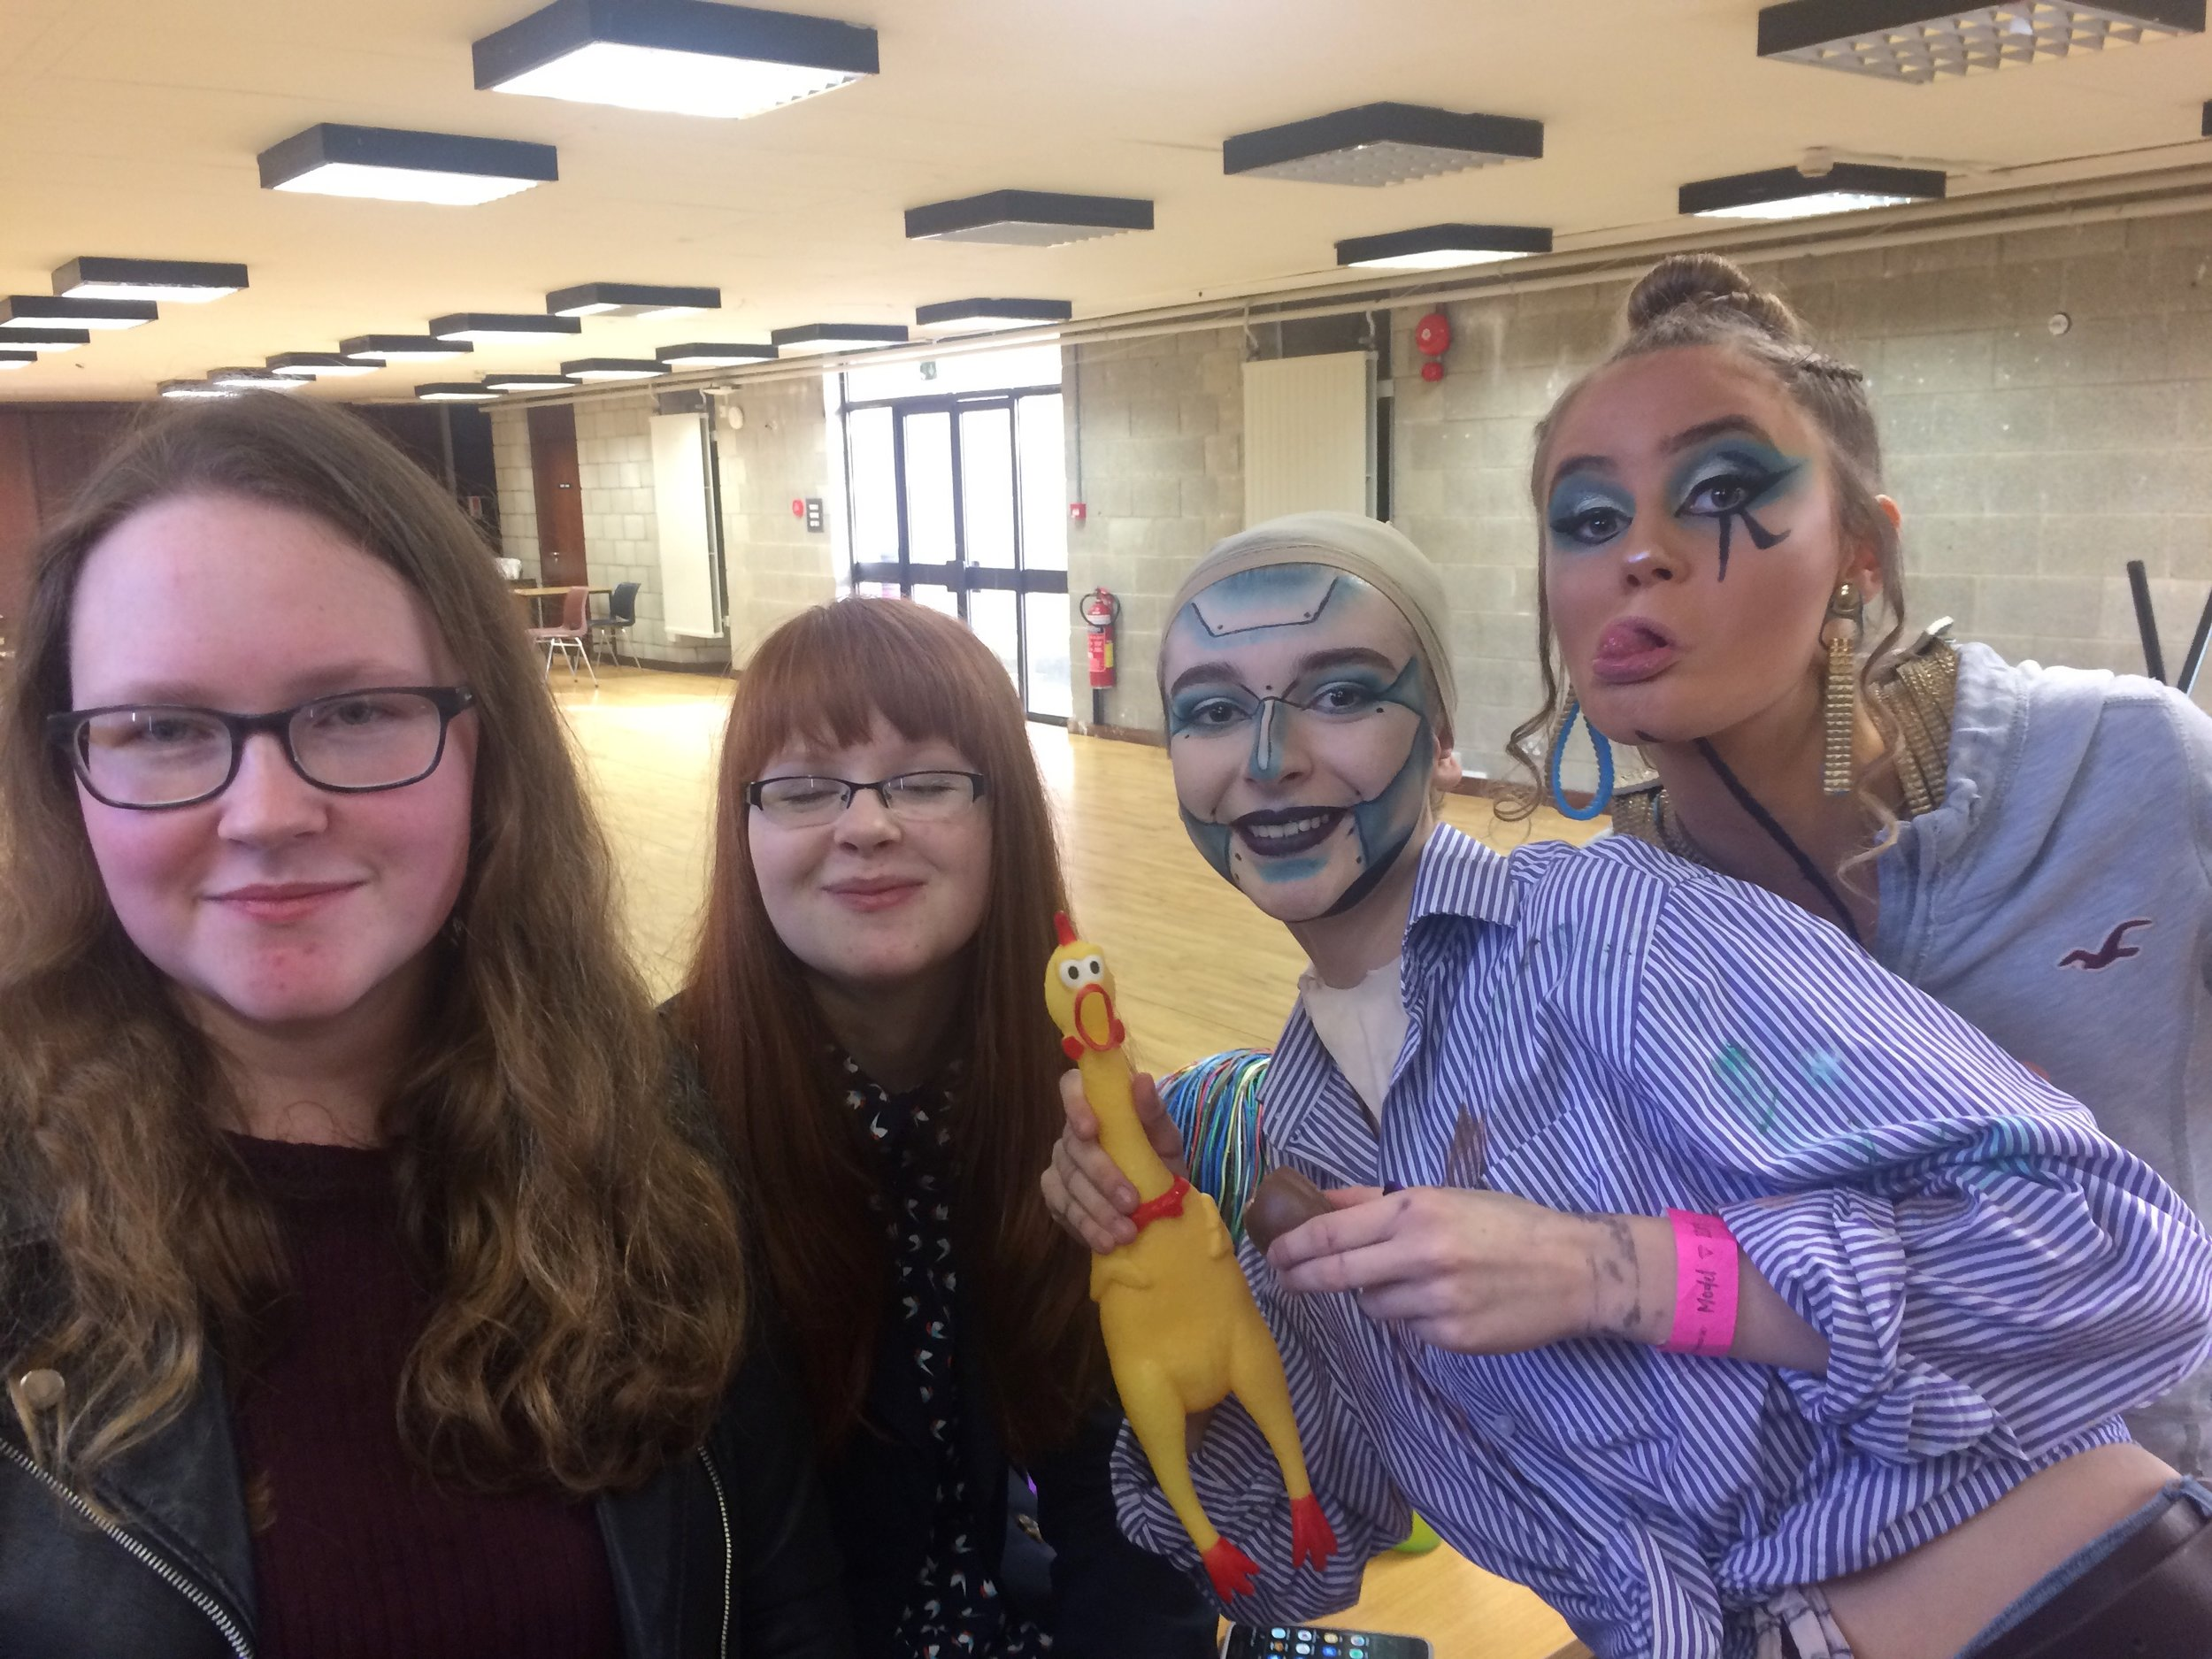 Caoimhe Diffley, Lavena Edelmann Harrington (and Caoimhe Collins)  - I AM ALIVE